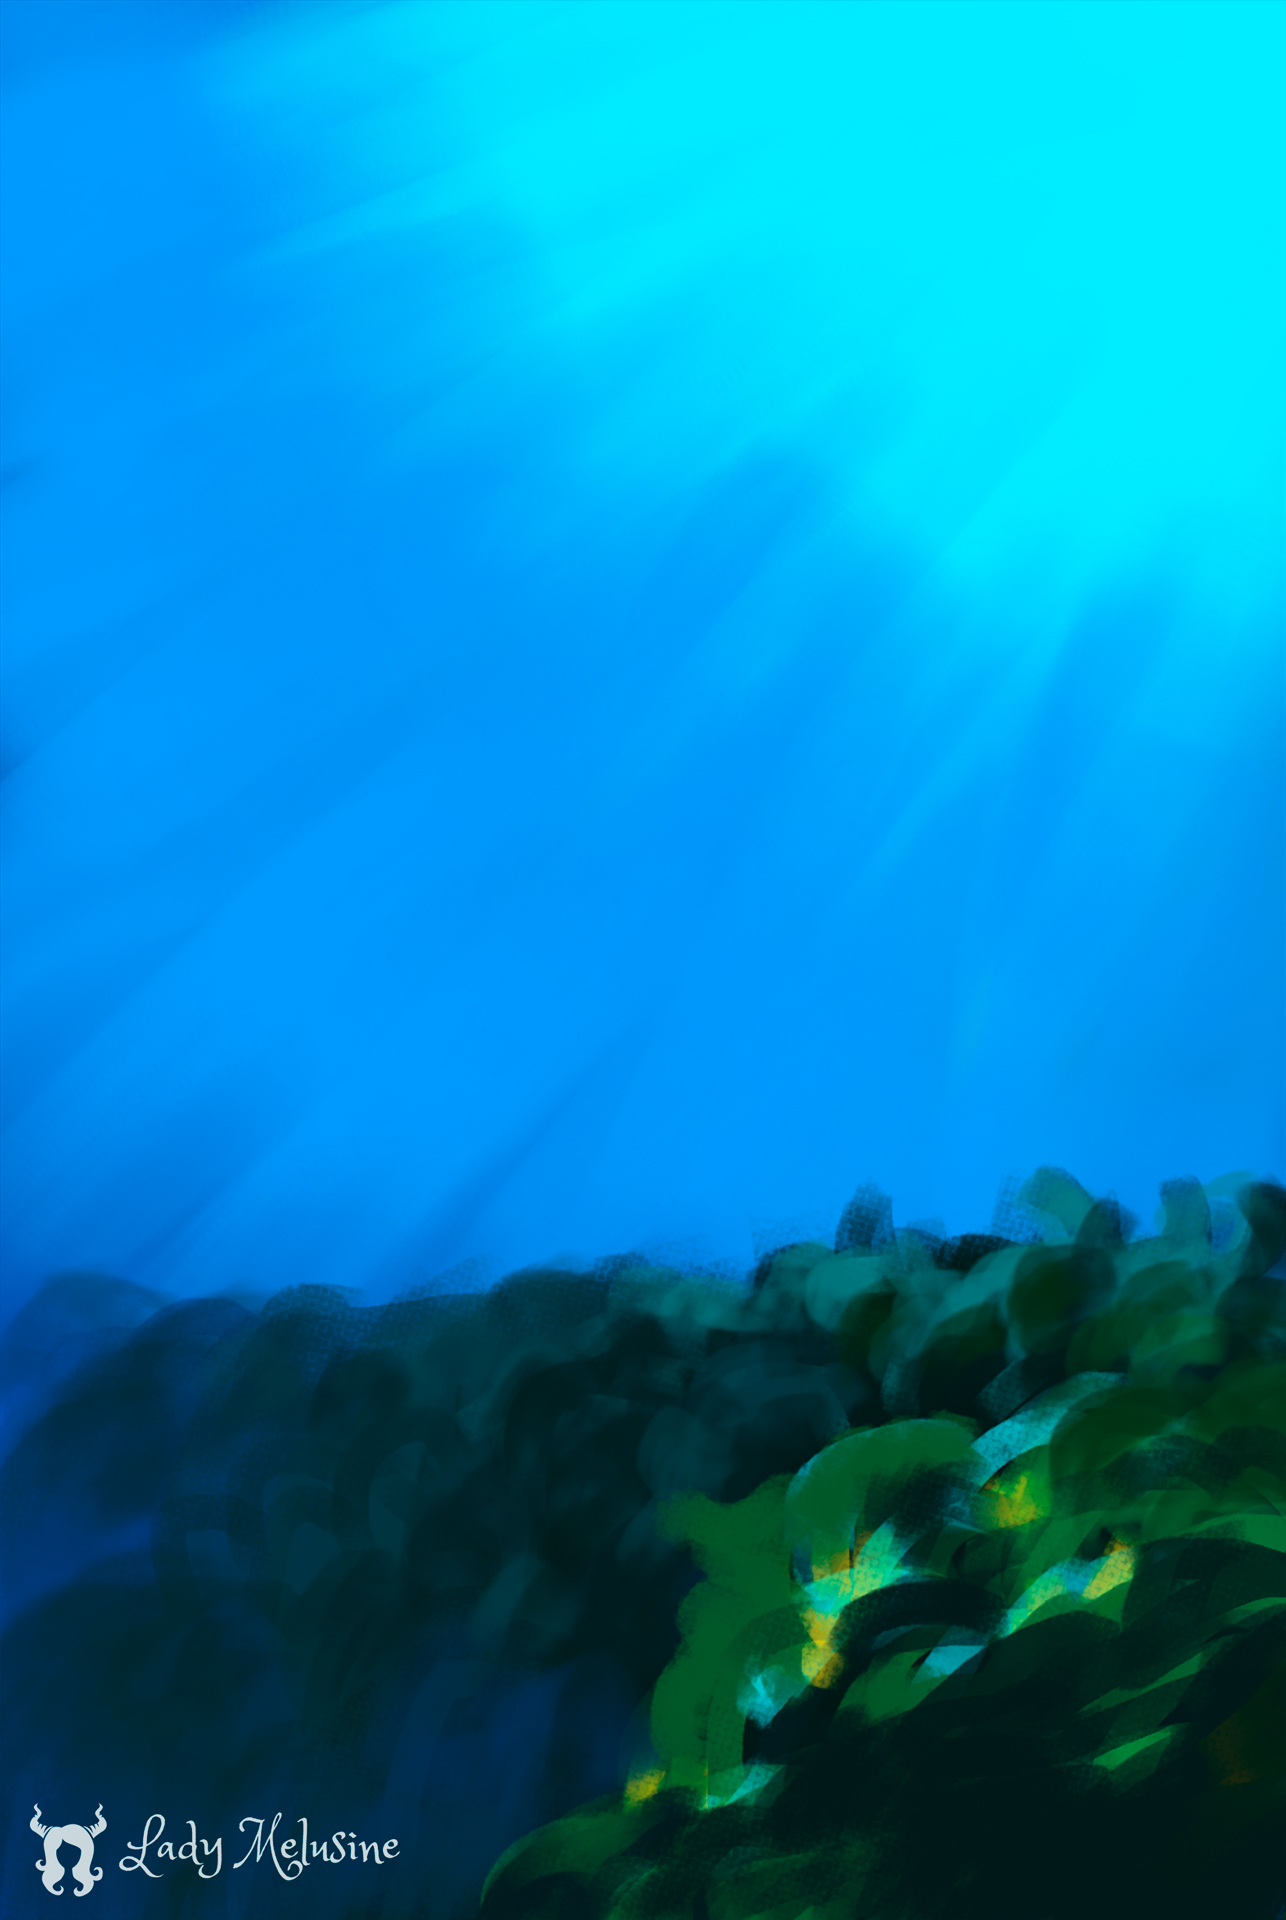 Digital Painting Carte Recifs Requins 03 Lady Melusine